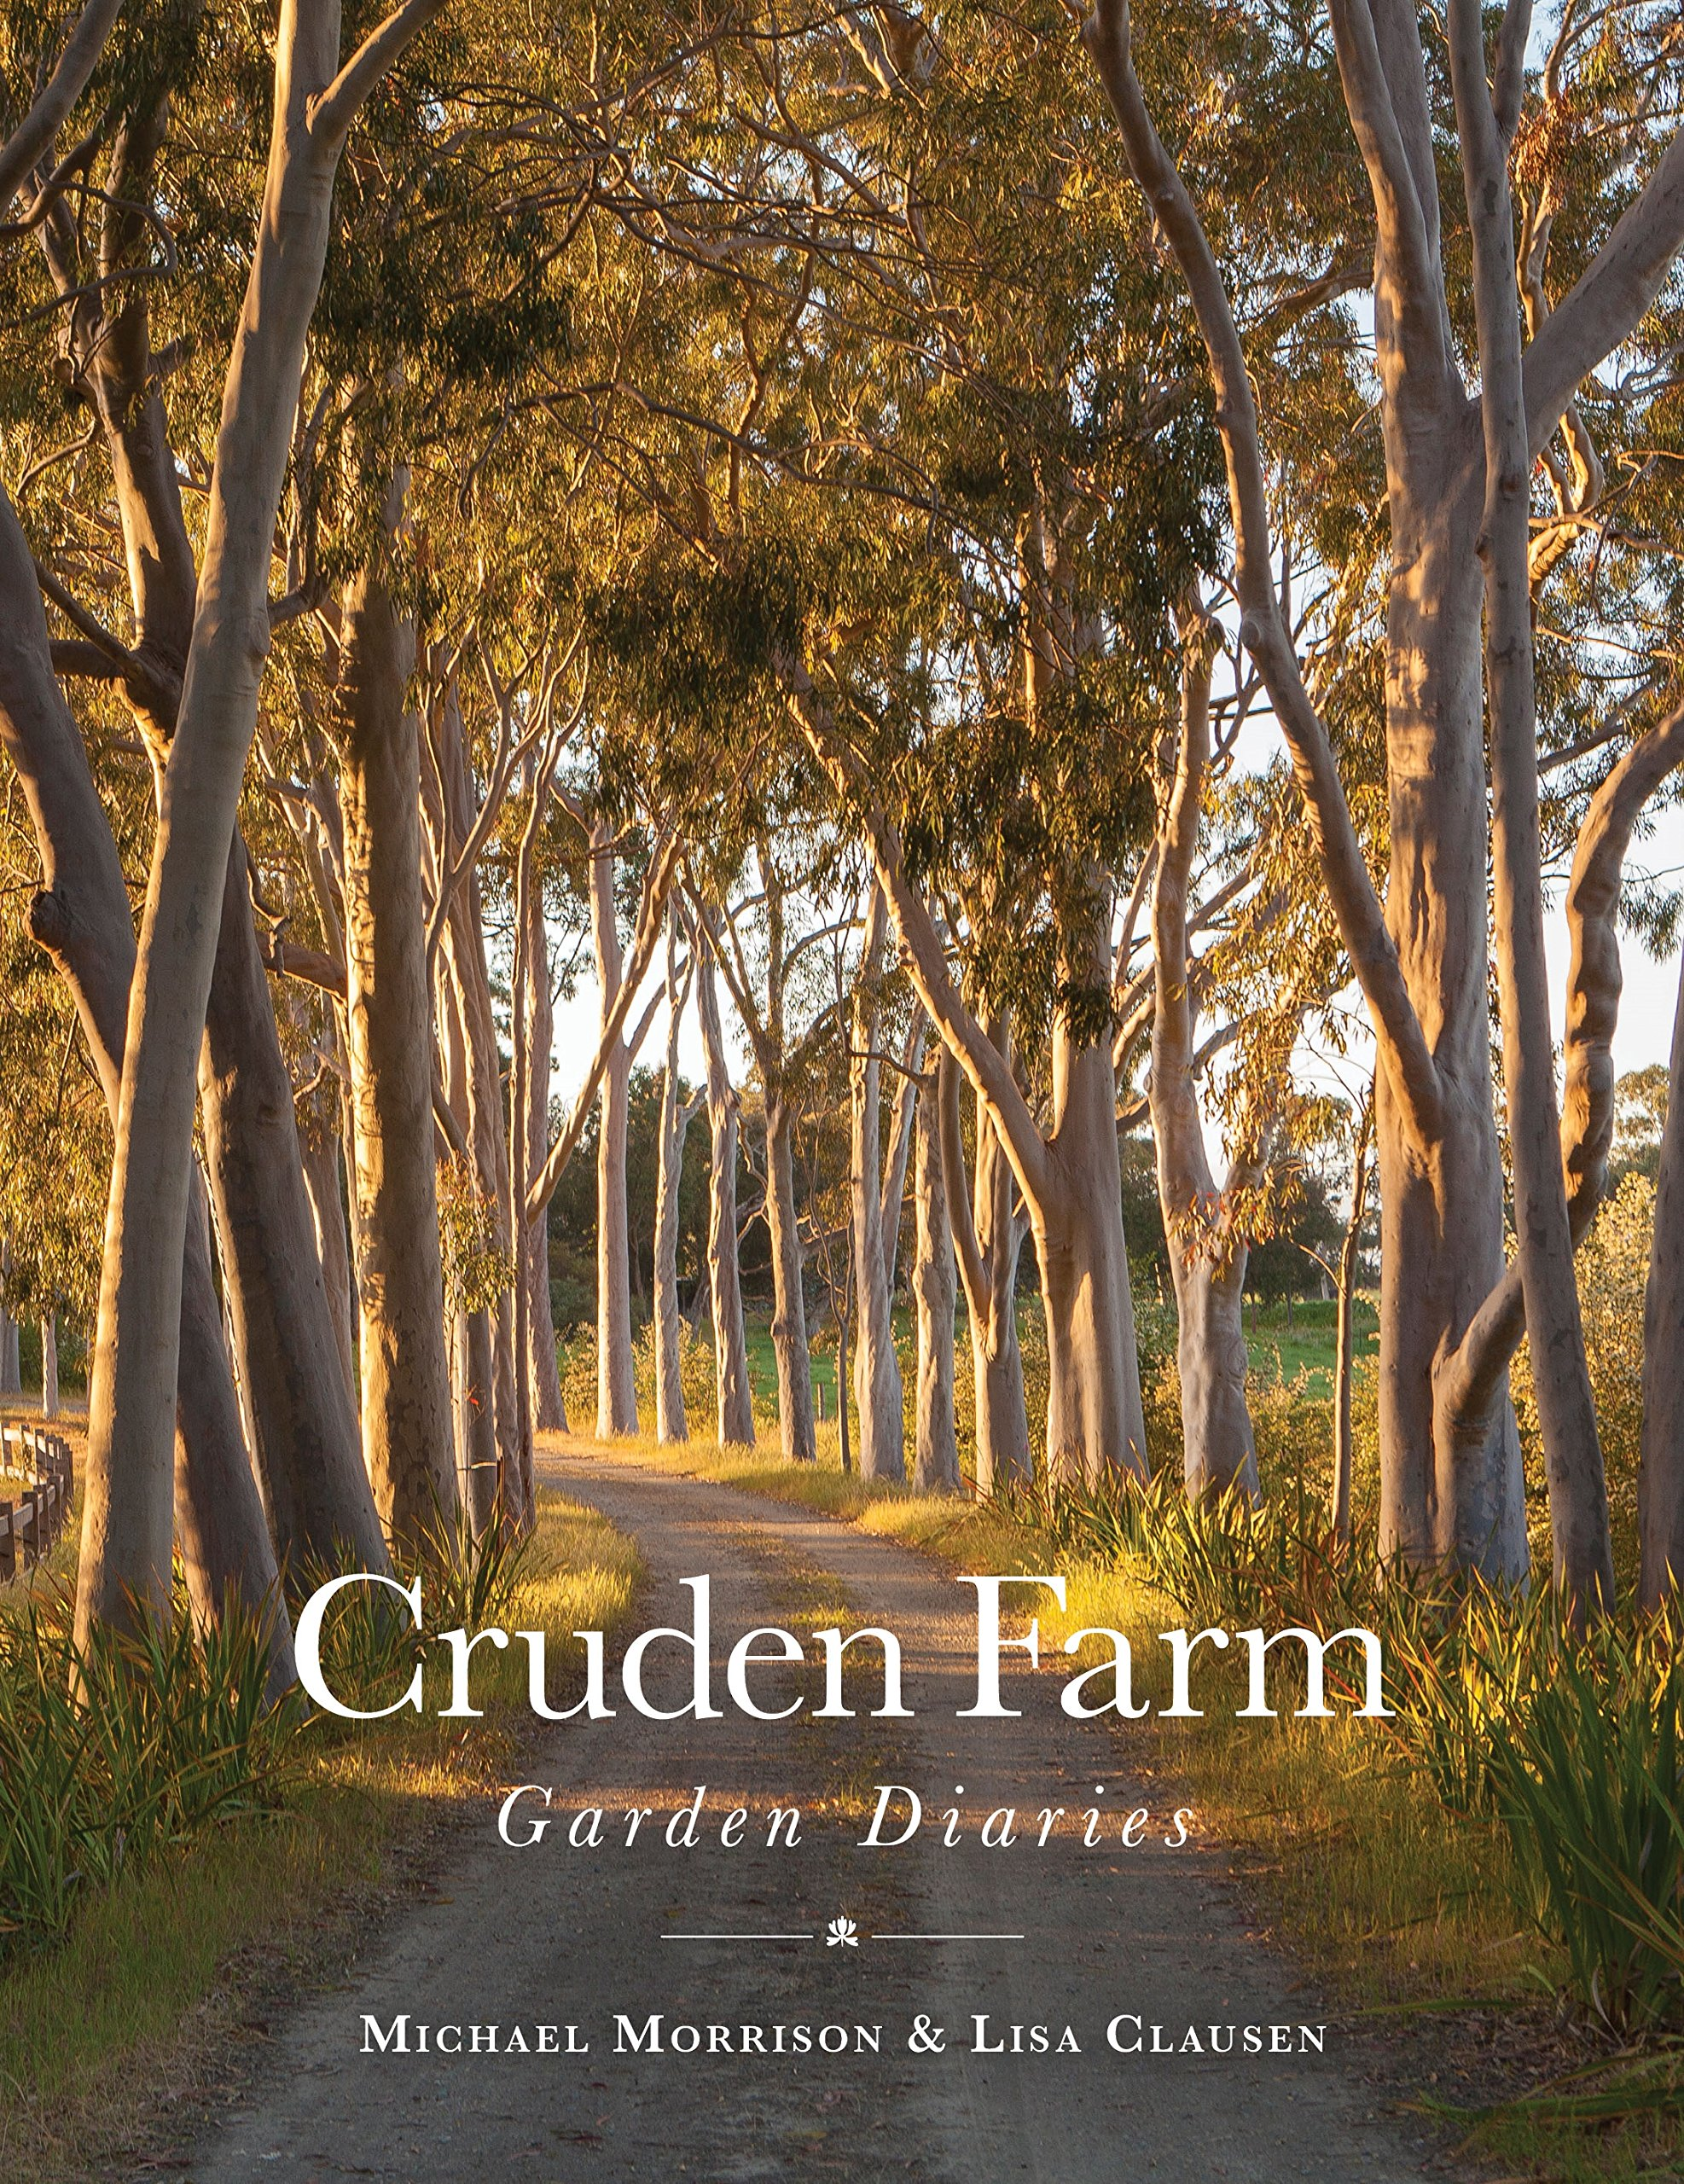 Amazon.com: Cruden Farm Garden Diaries (9781921384158): Michael ...